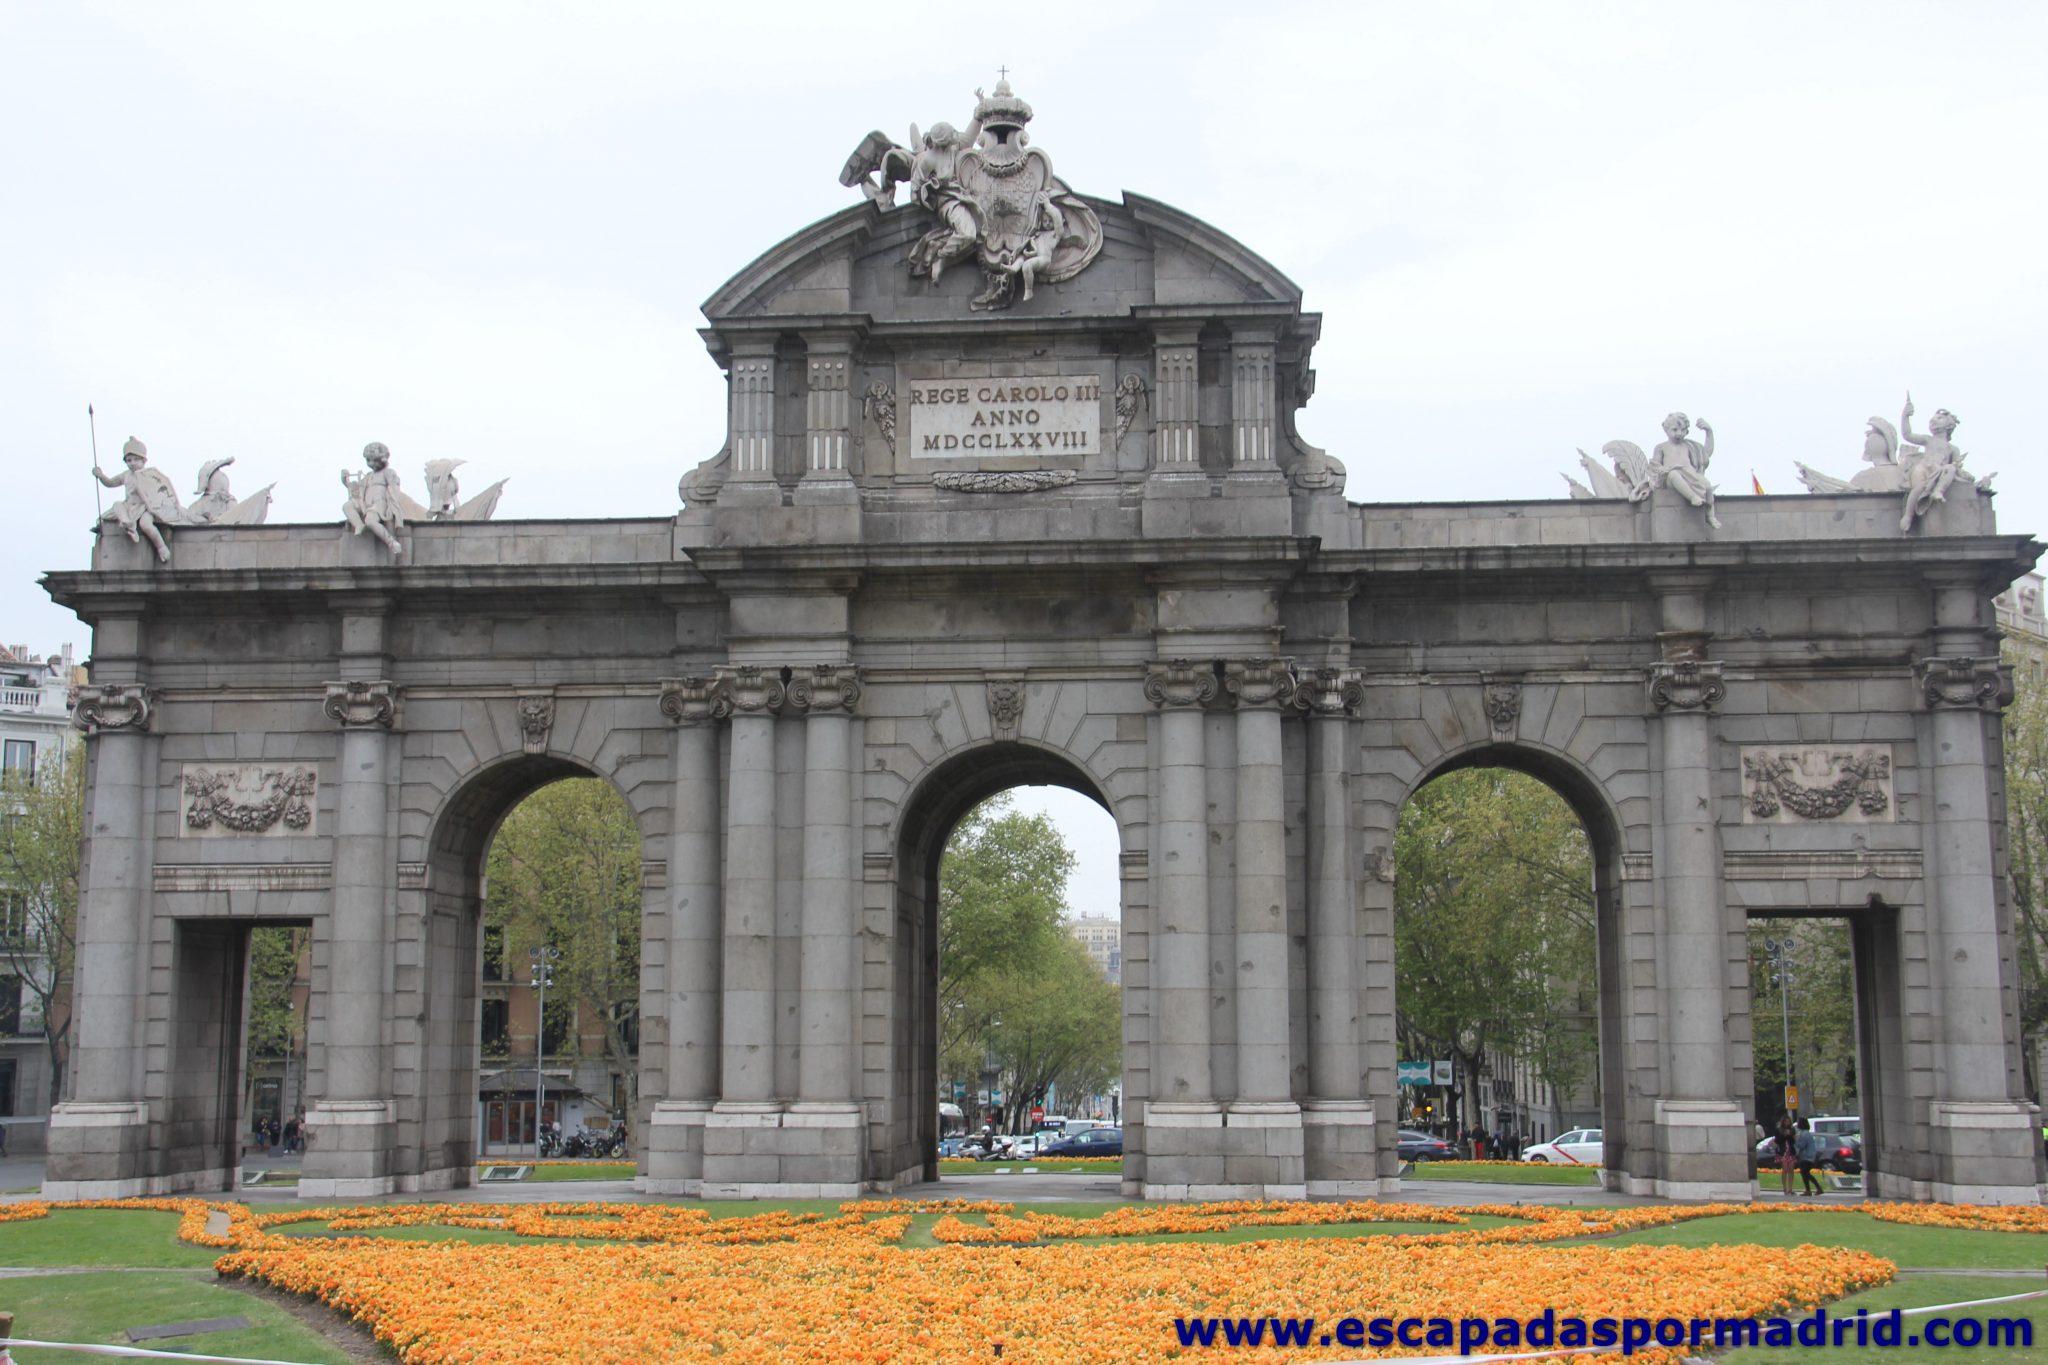 foto del diseño exterior de la Puerta de Alcalá